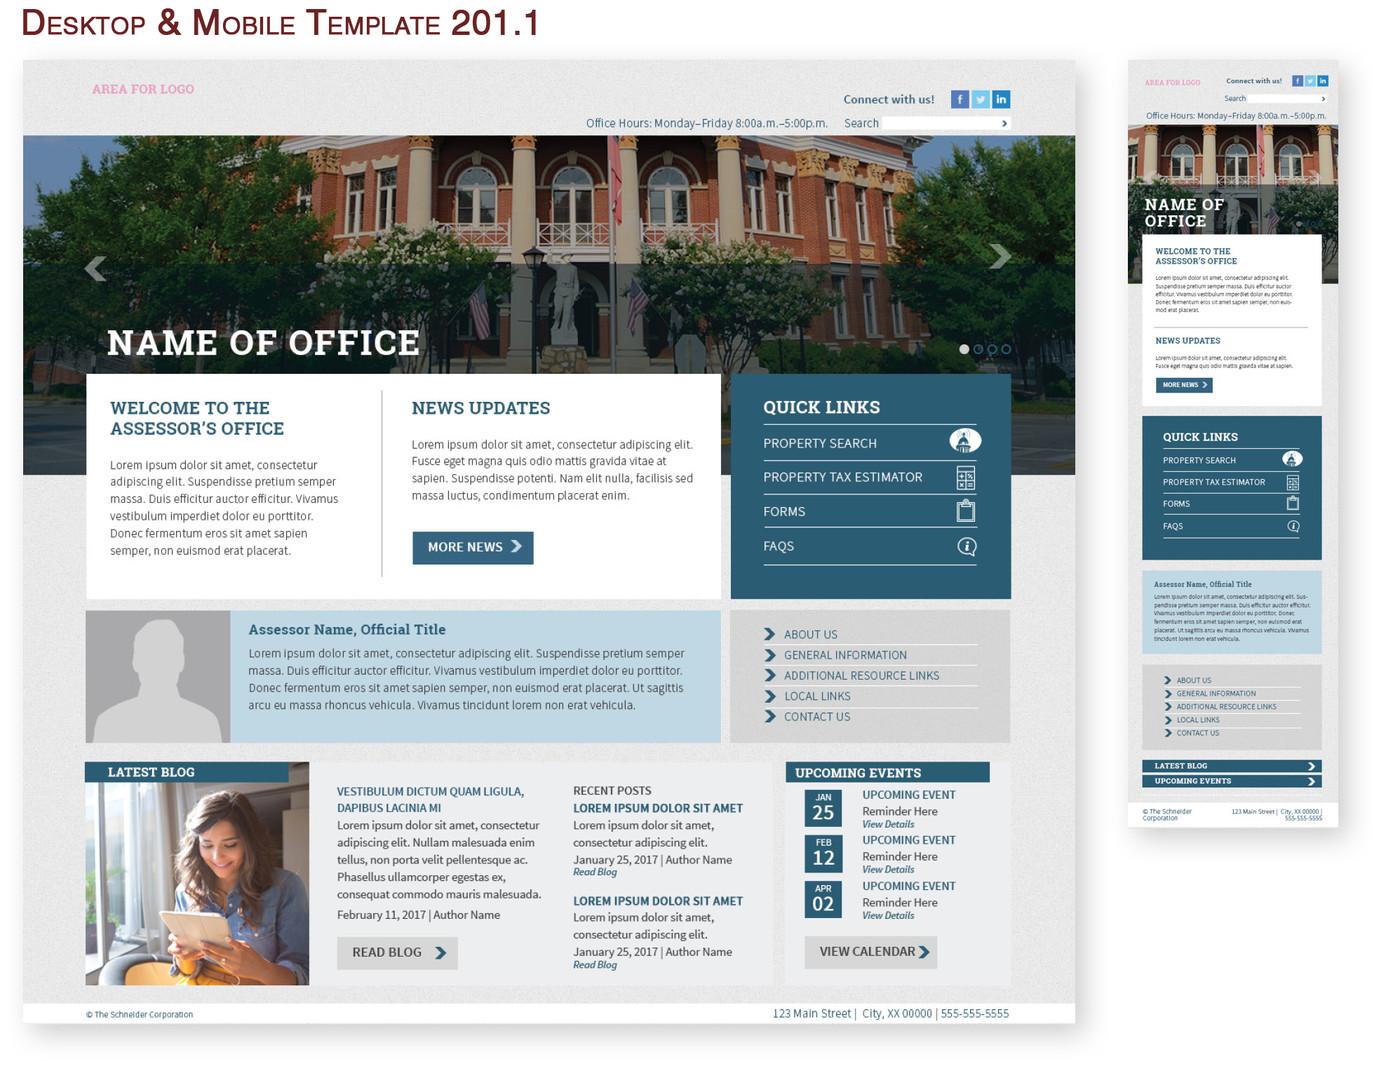 Desktop & Mobile Template 201.1